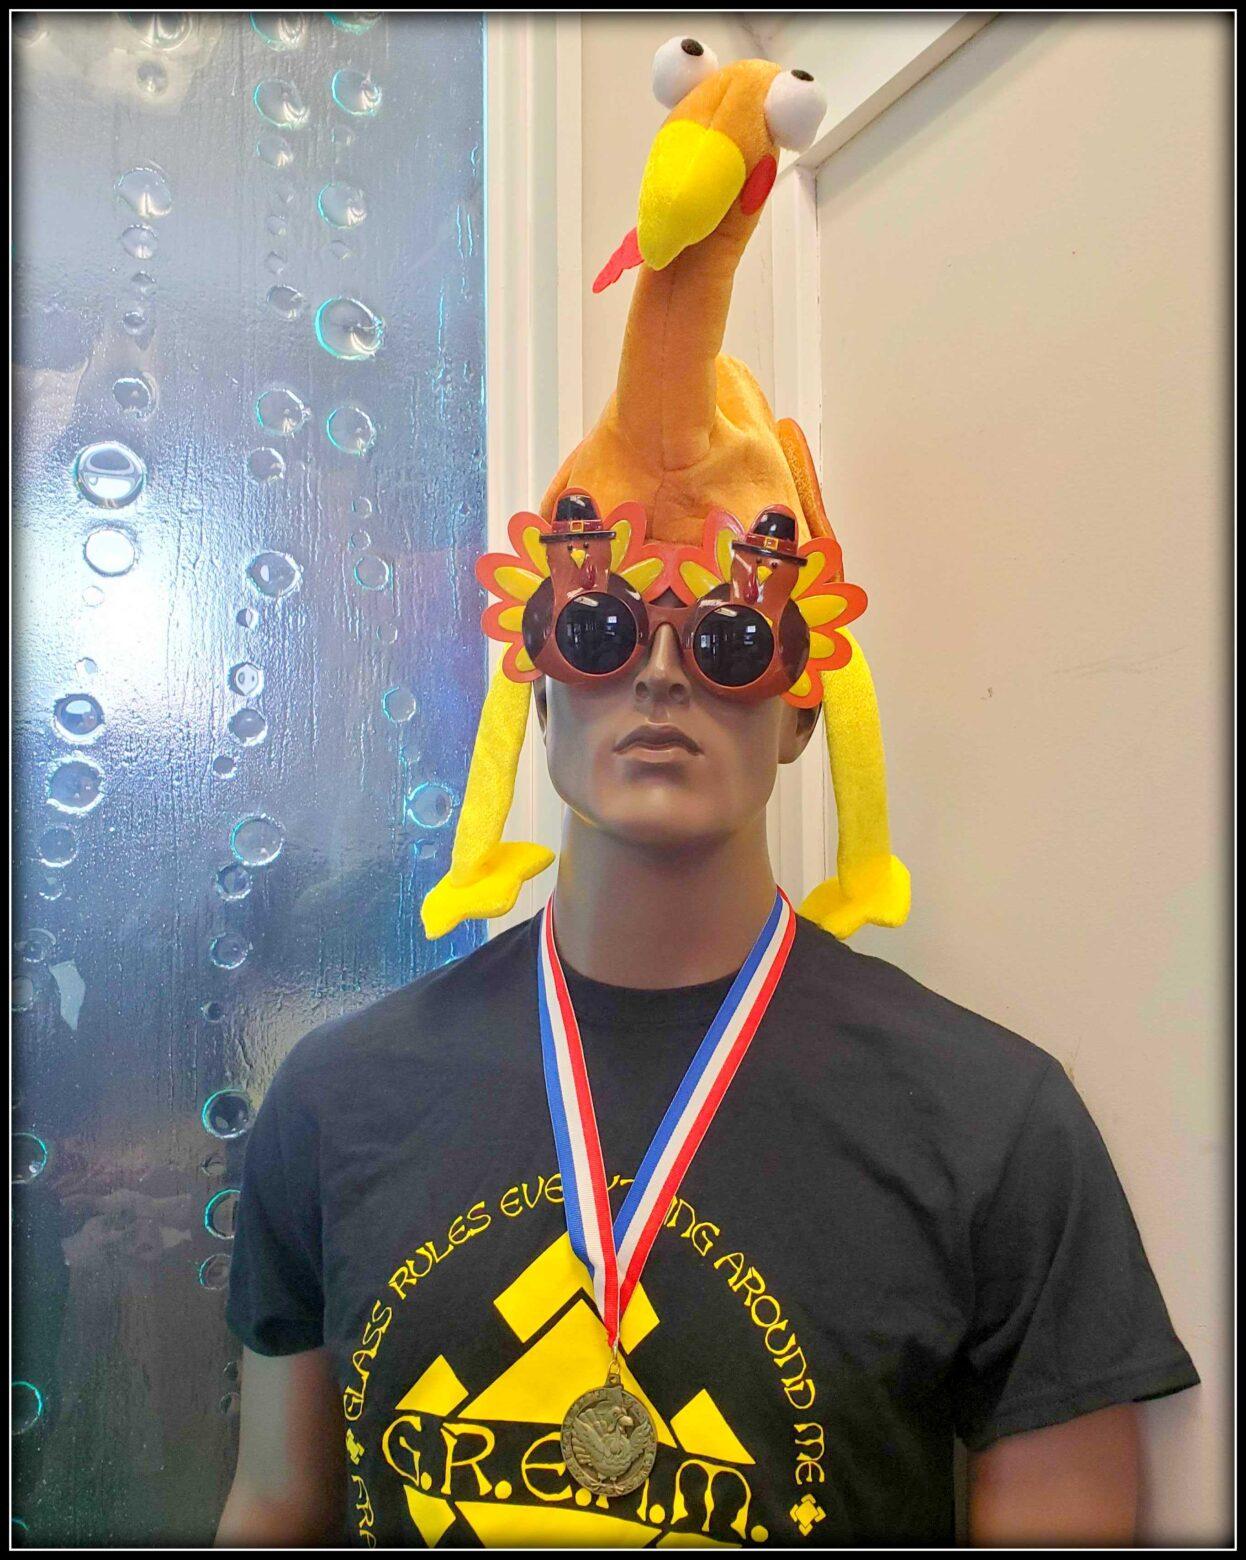 2nd Annual Hand Turkey Contest